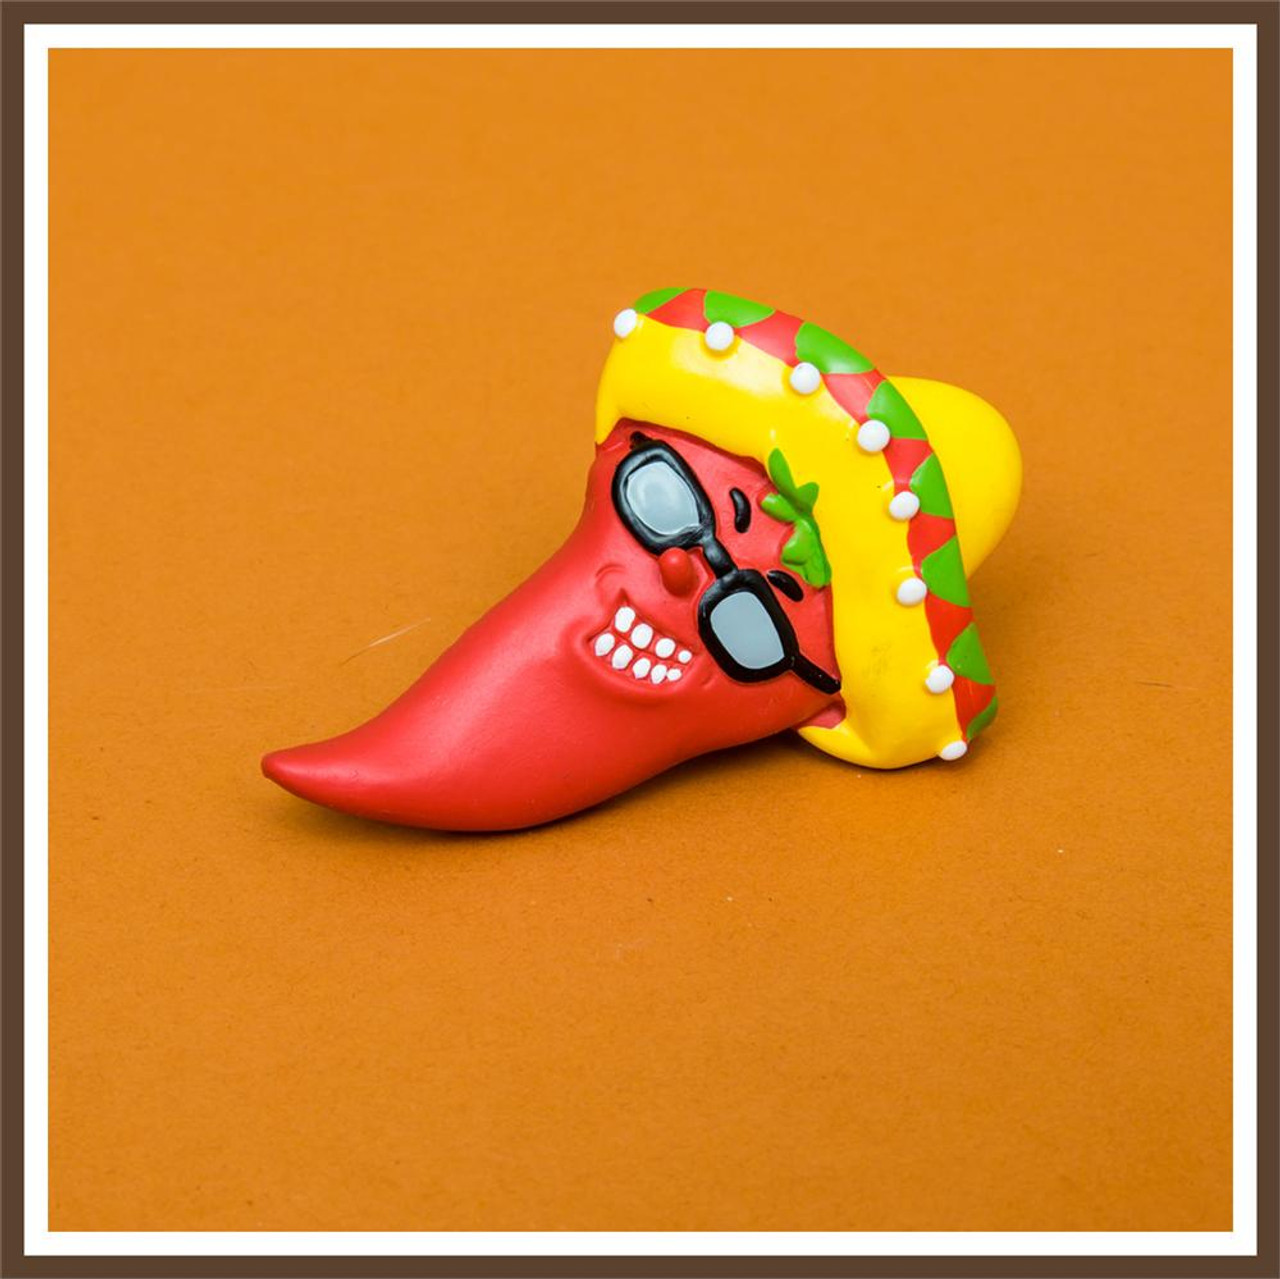 Sunglass Chili Pepper Magnet